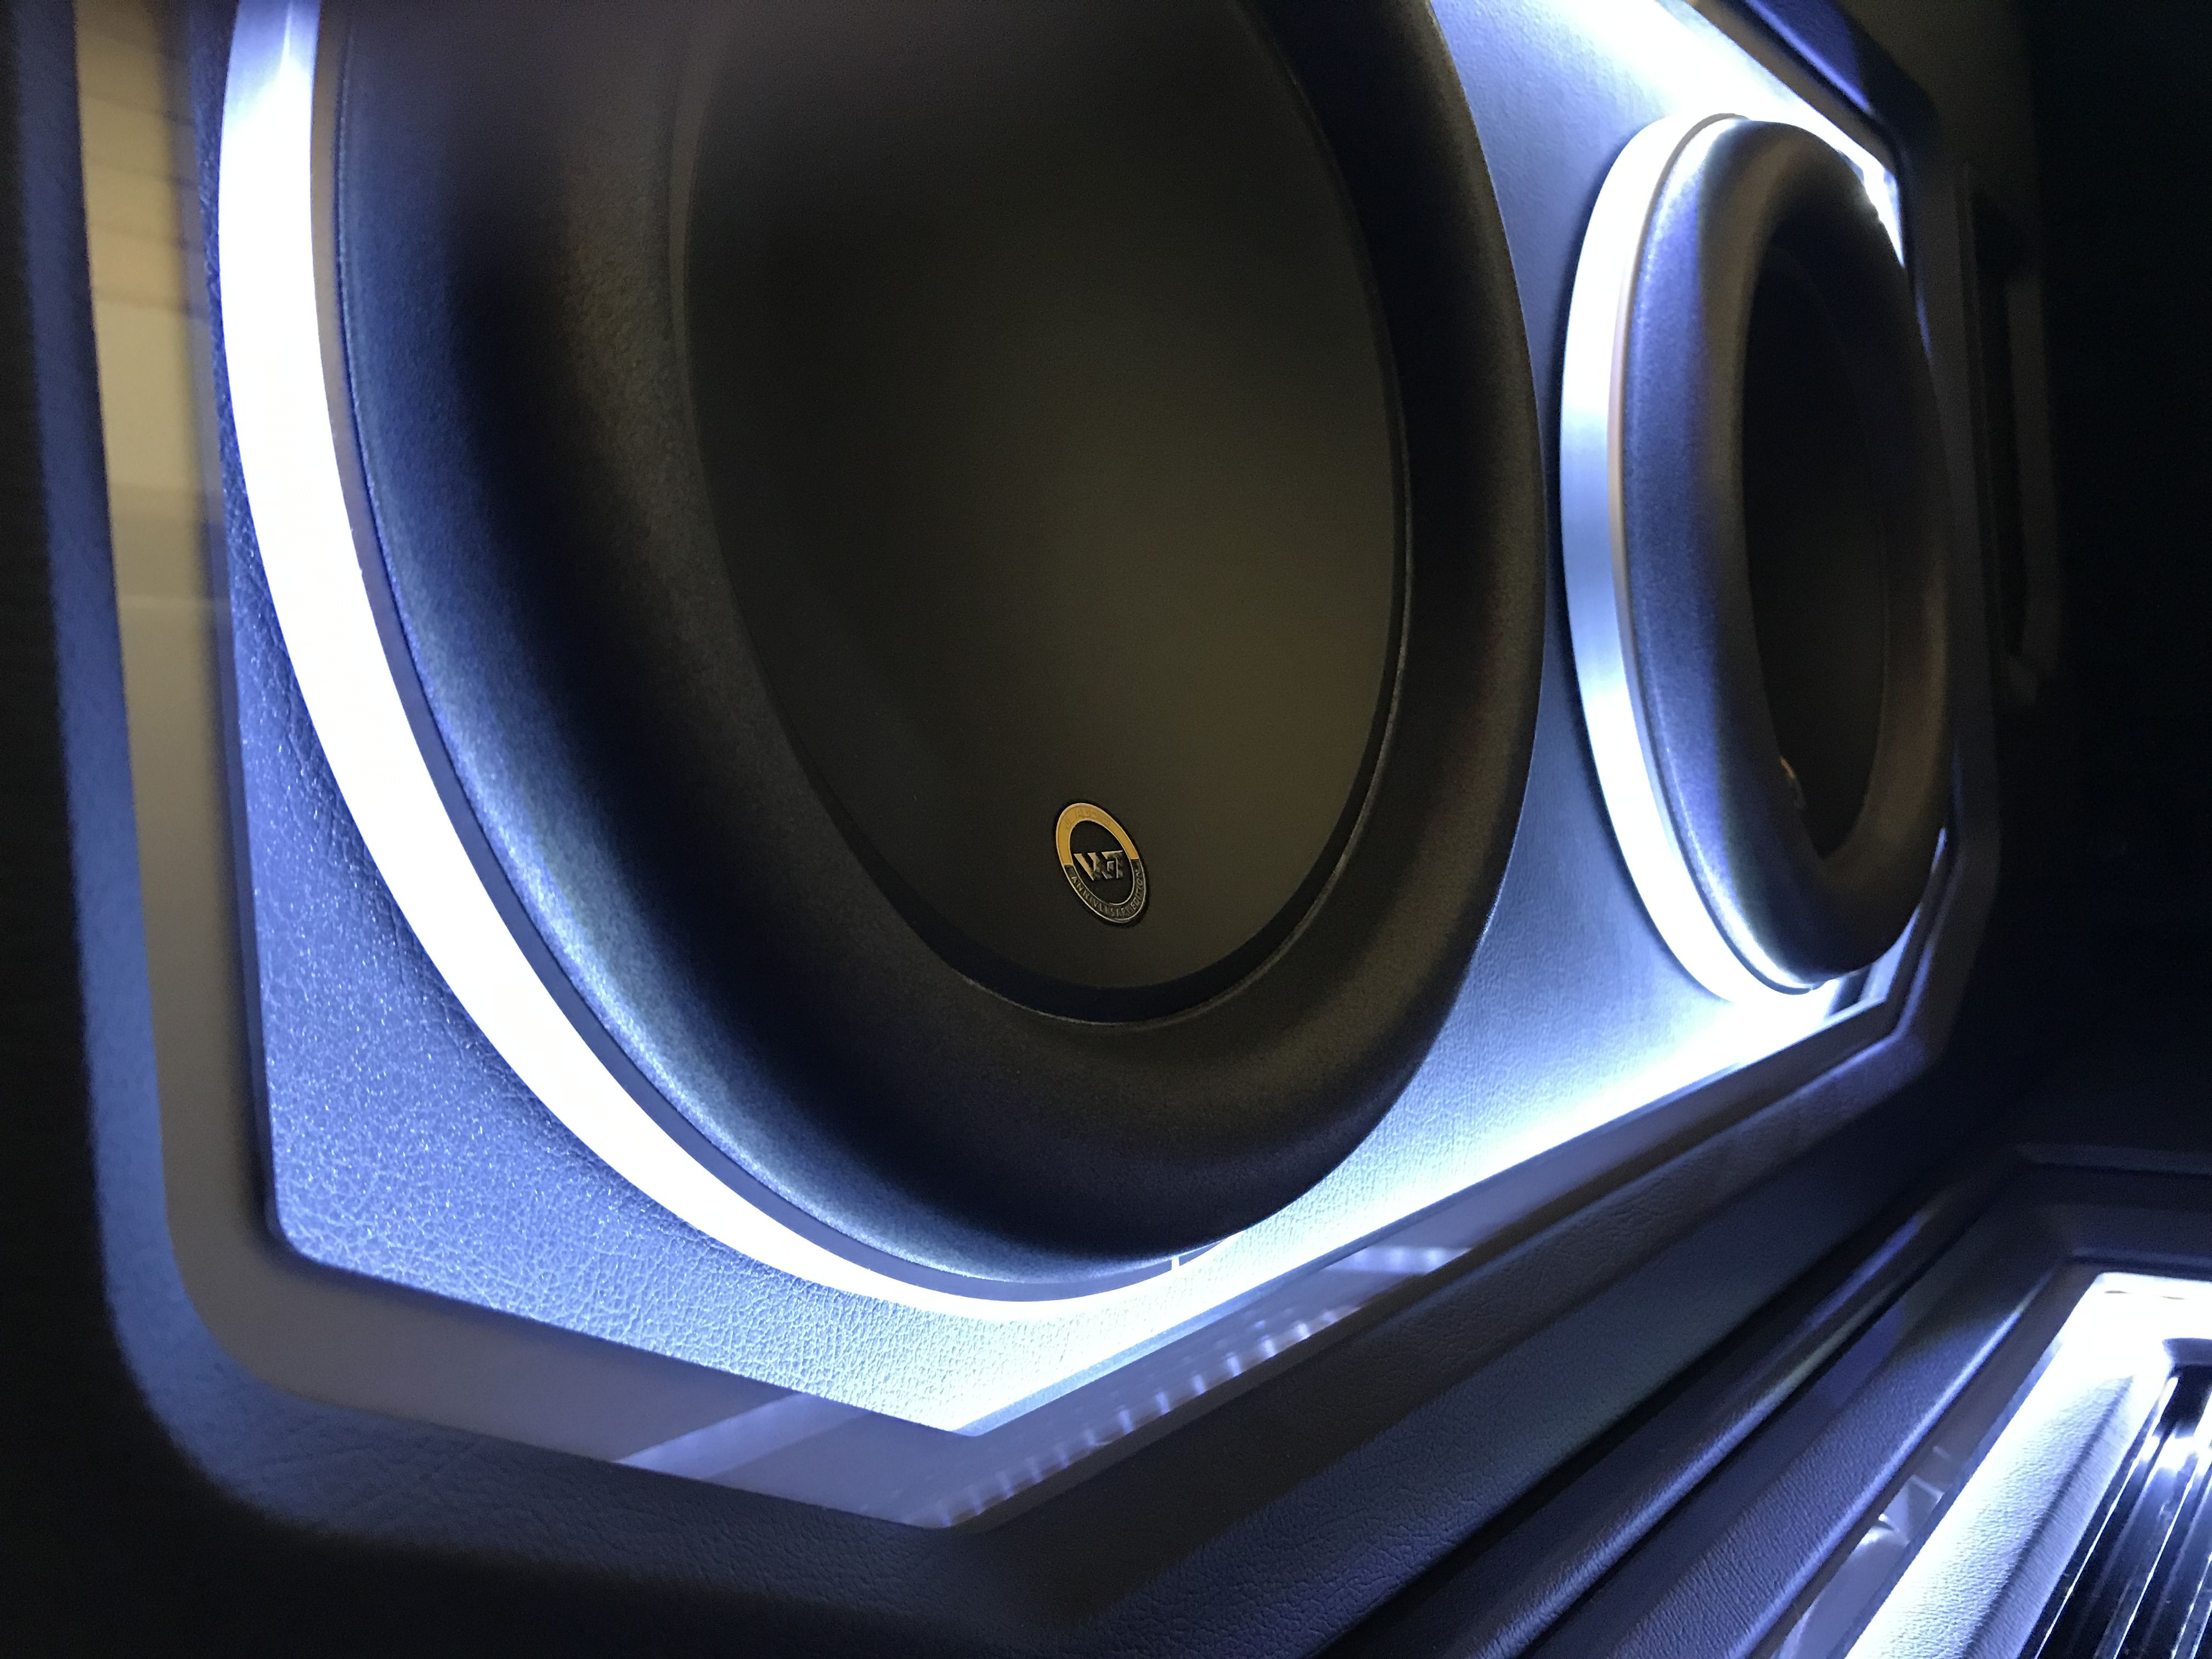 Jlaudio 10w7 Marklanddesigns Caraudio Car Audio Systems Car Audio Custom Car Audio